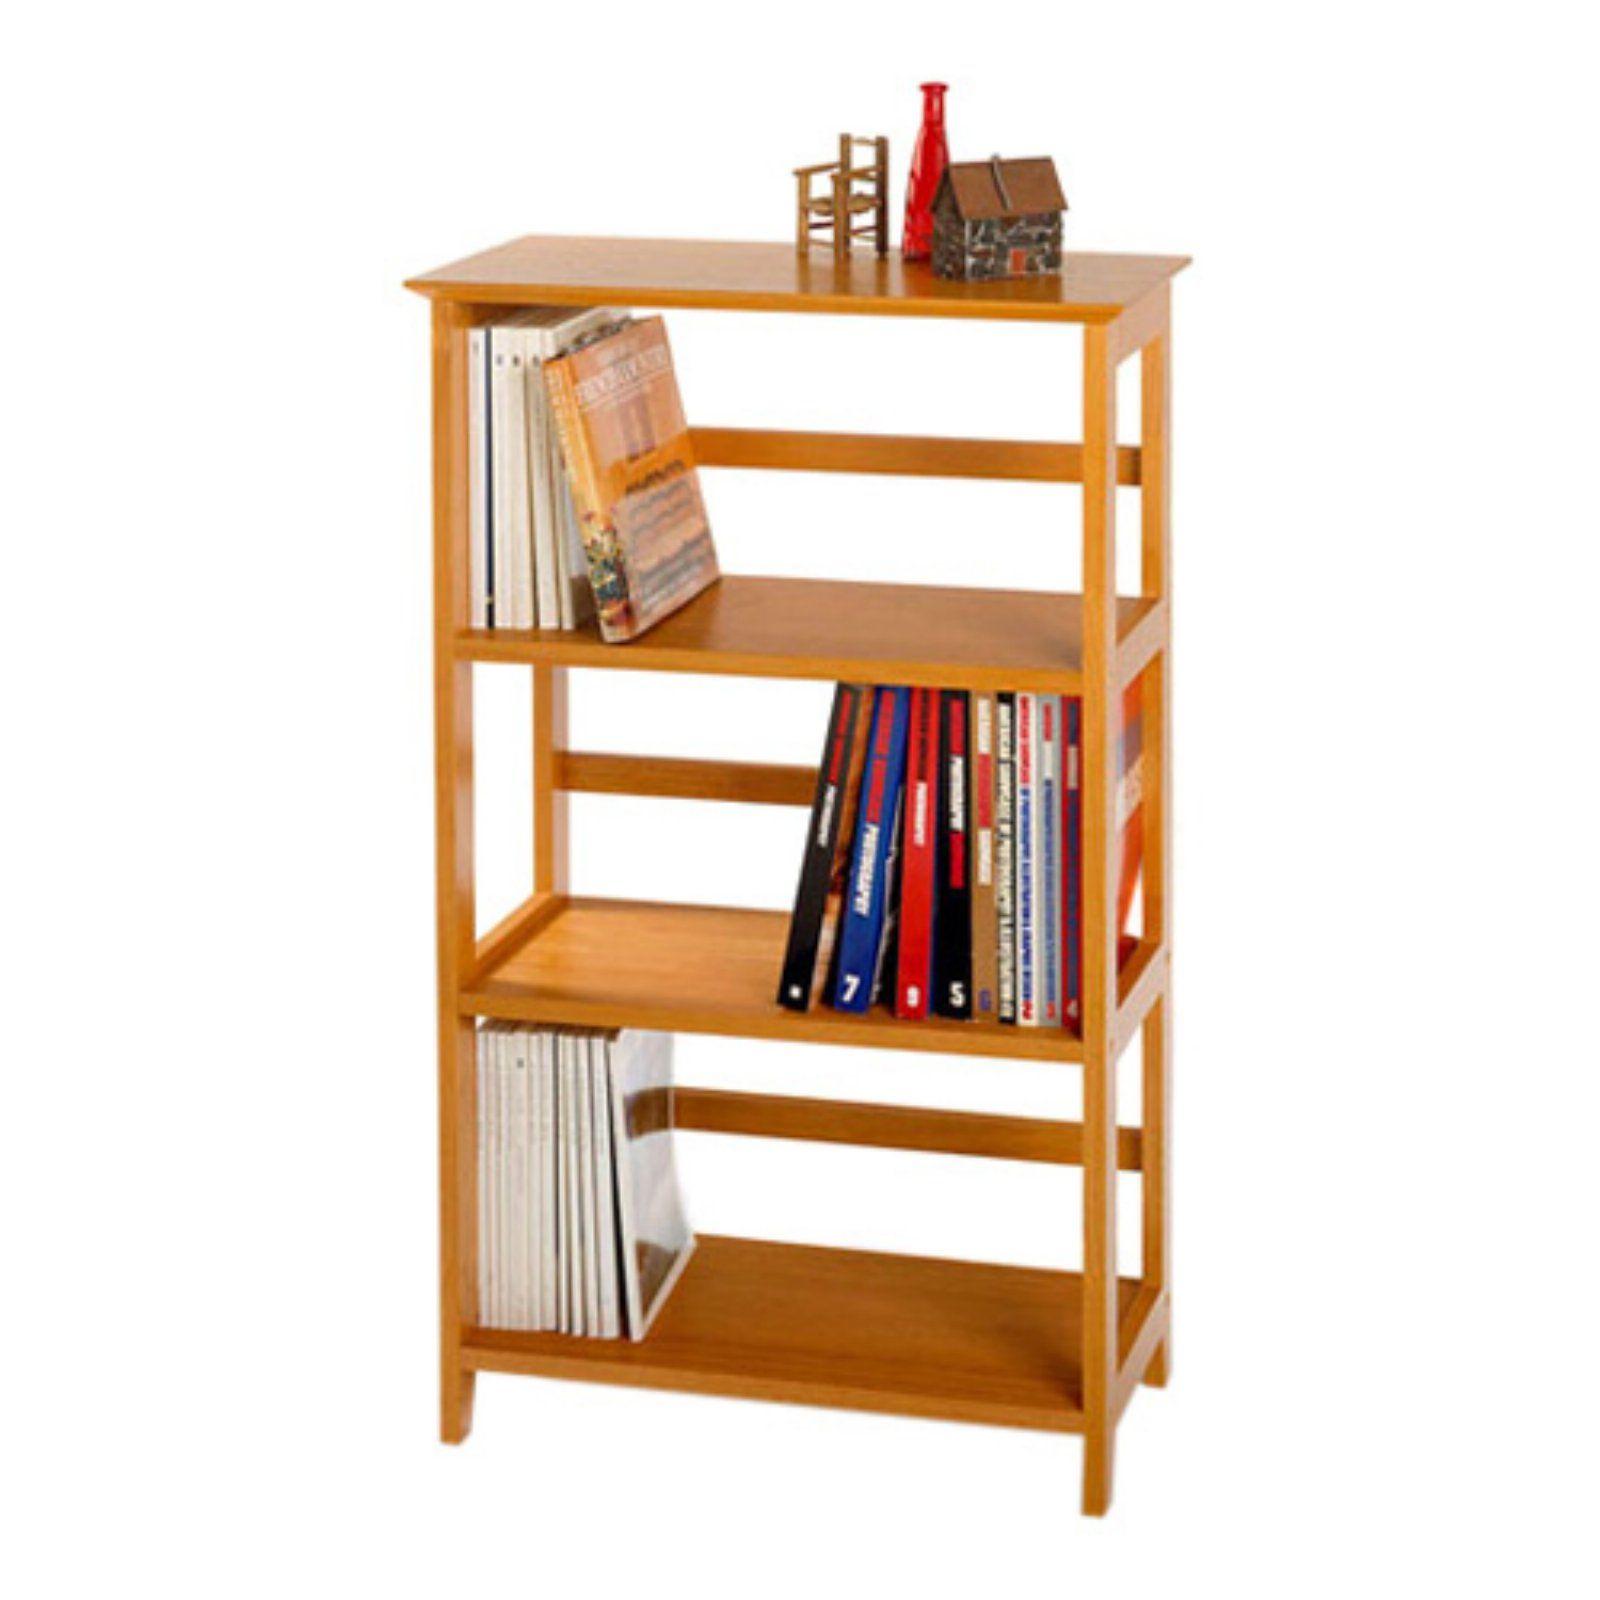 Winsome Studio 3 Tier Wood Bookshelf Home Office Furniture Desk Wood Bookshelves